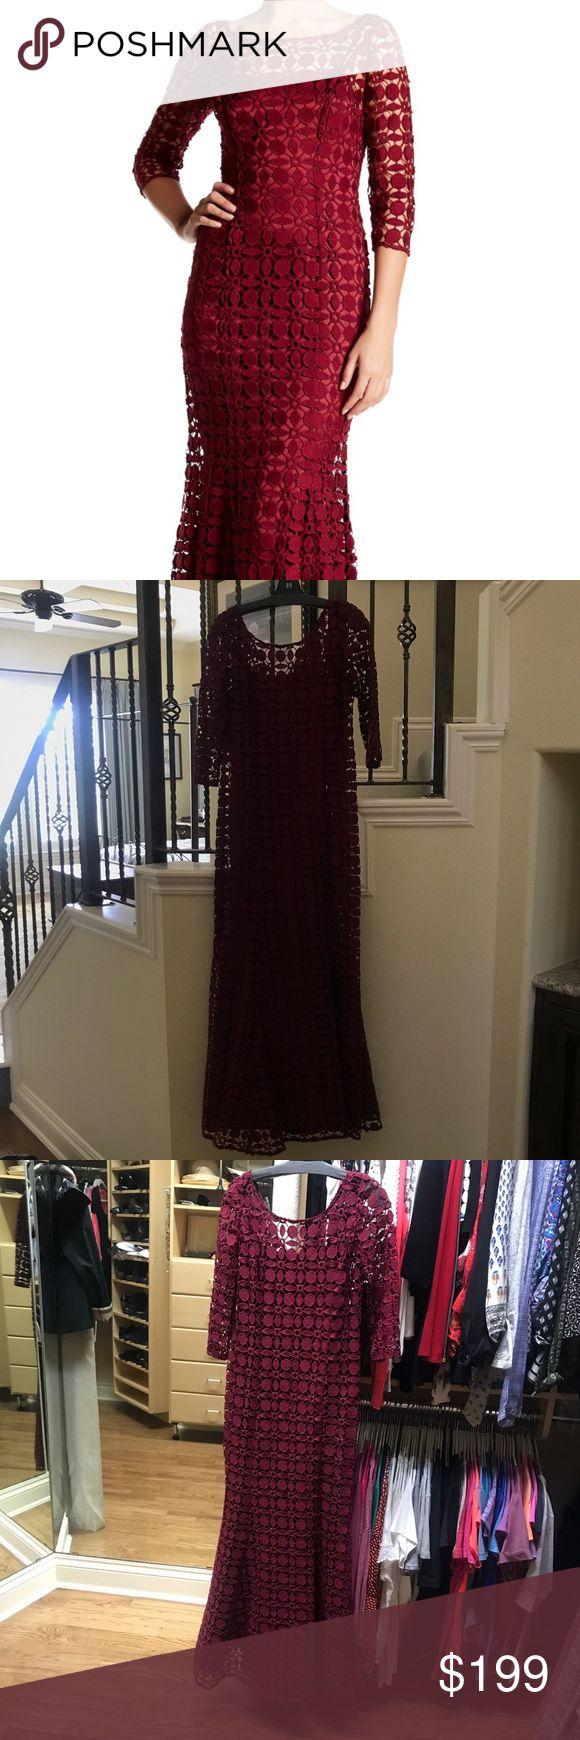 Kay Unger Crochet Dress 3/4 Sleeve Crochet Lace Dress Kay Unger Dresses Maxi